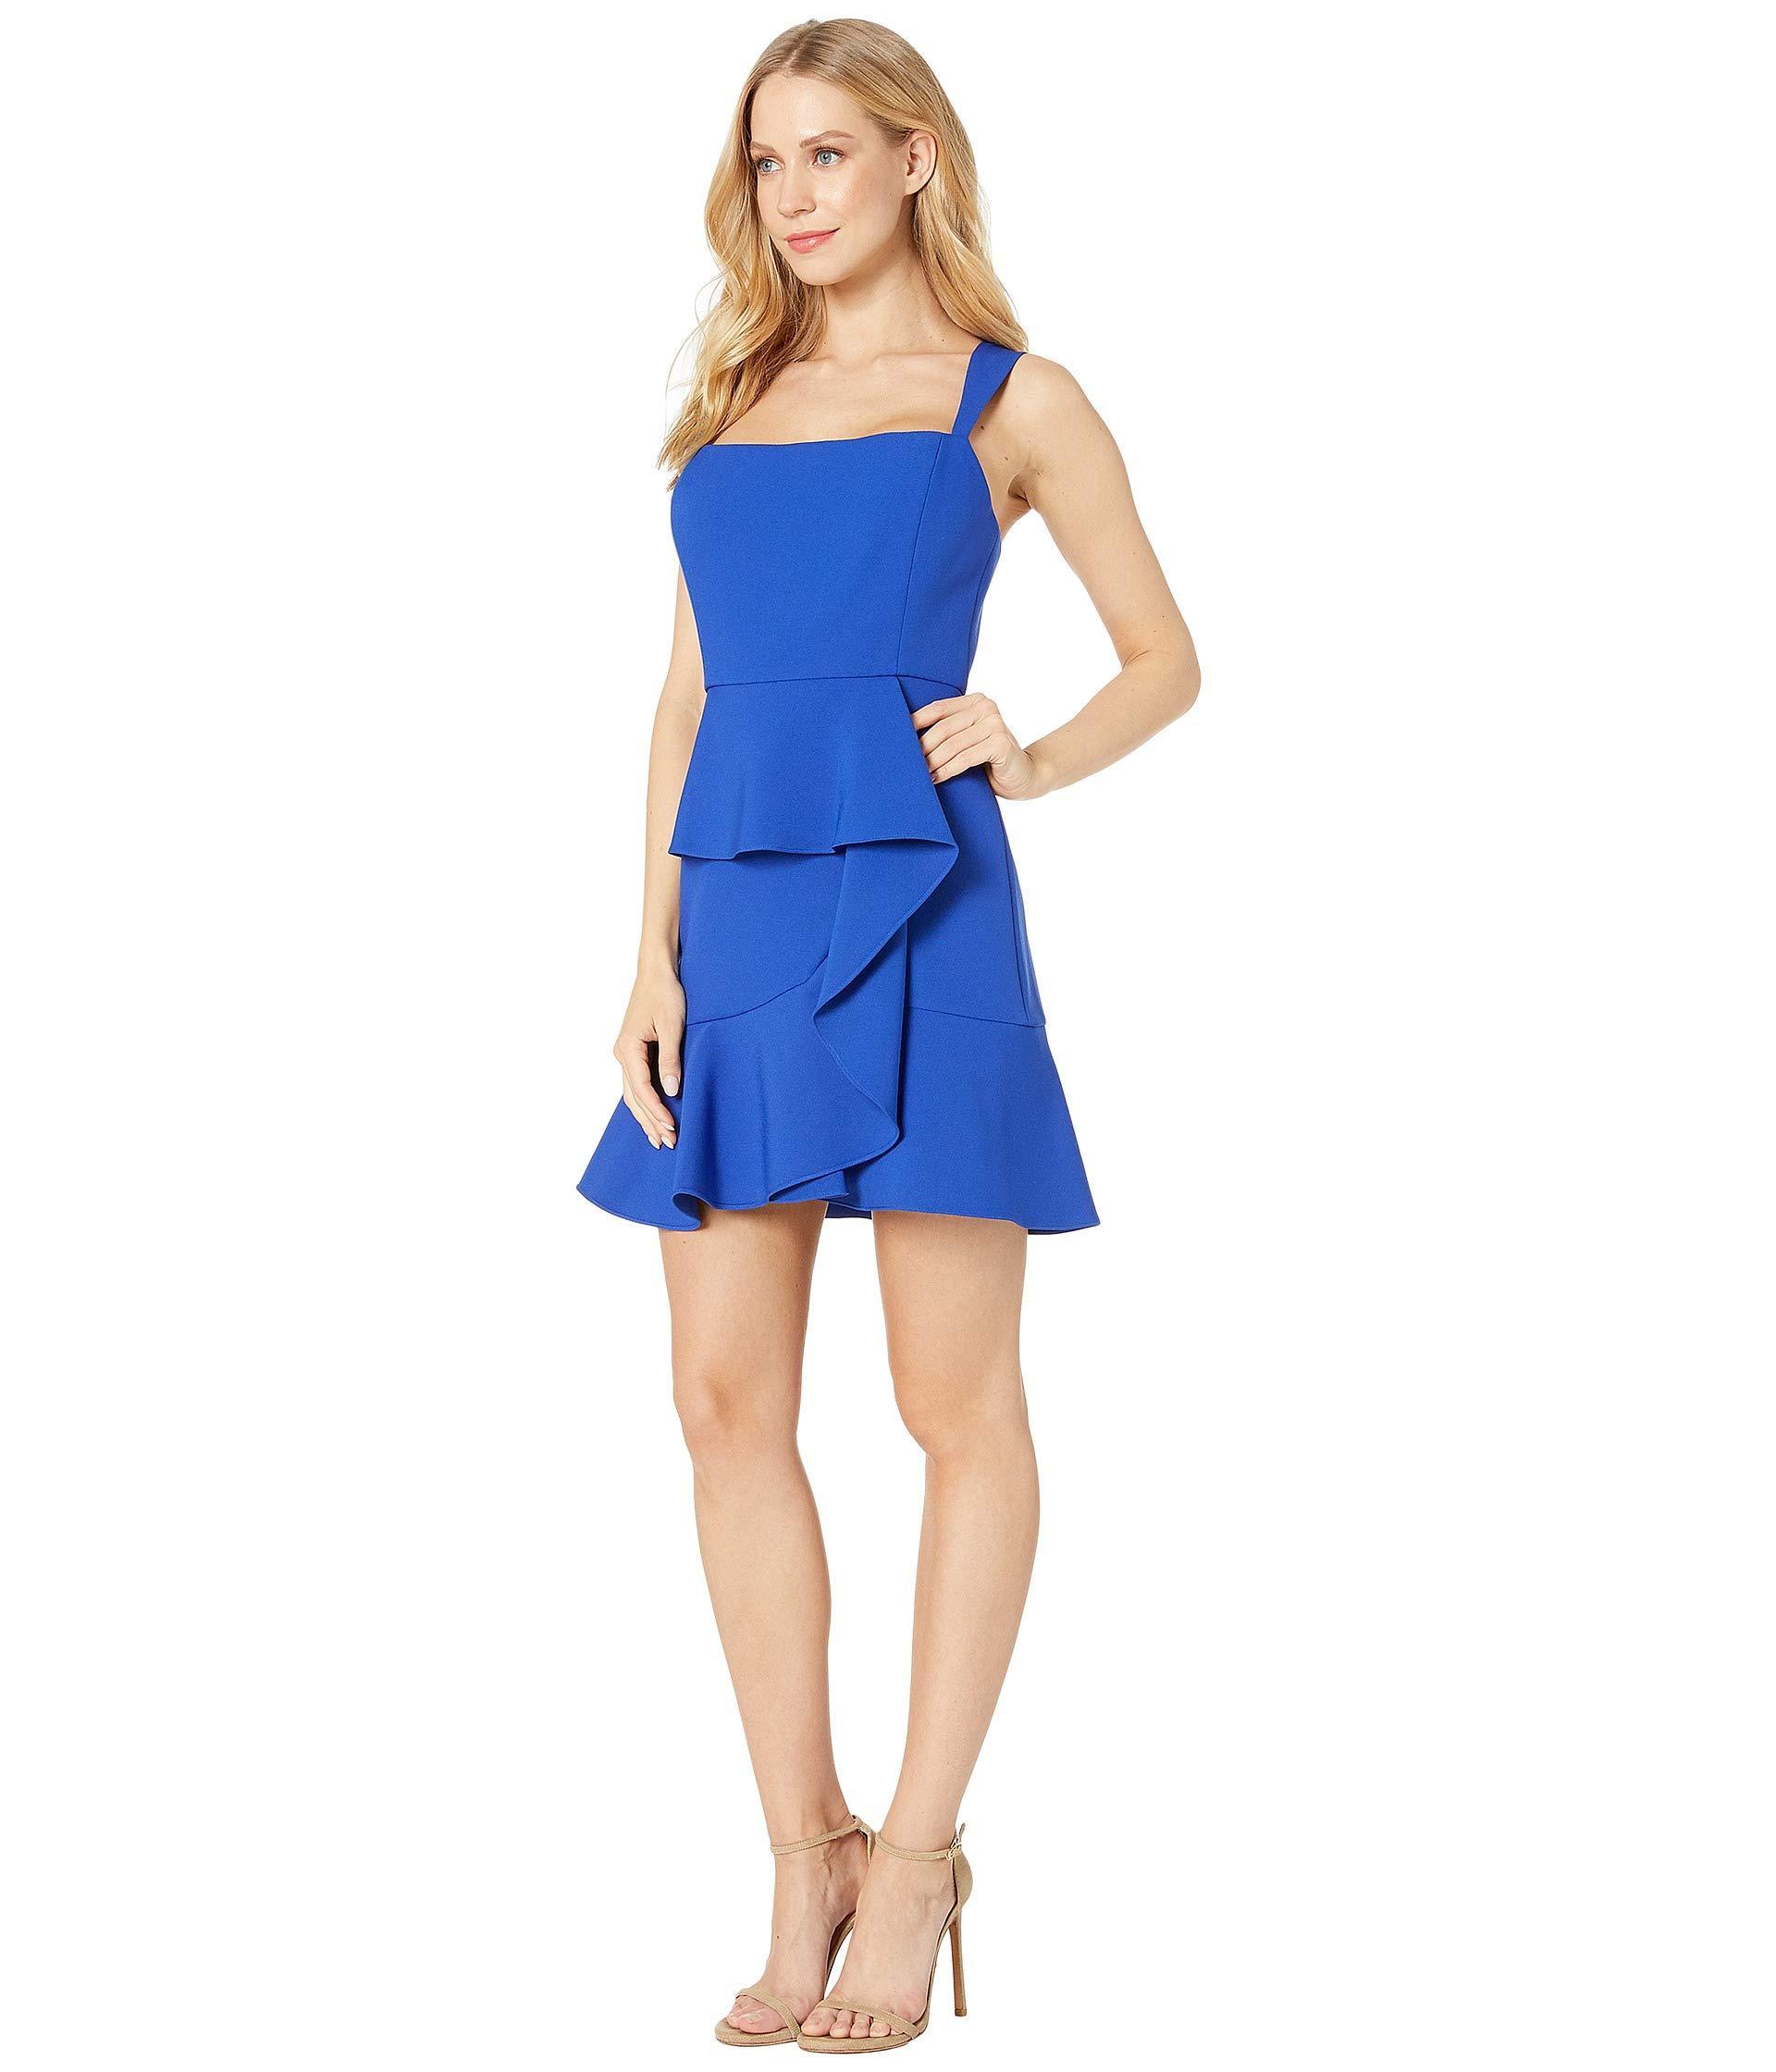 214b9ffdfe3 BCBGMAXAZRIA Woven Evening Dress (royal Blue) Women's Clothing in ...